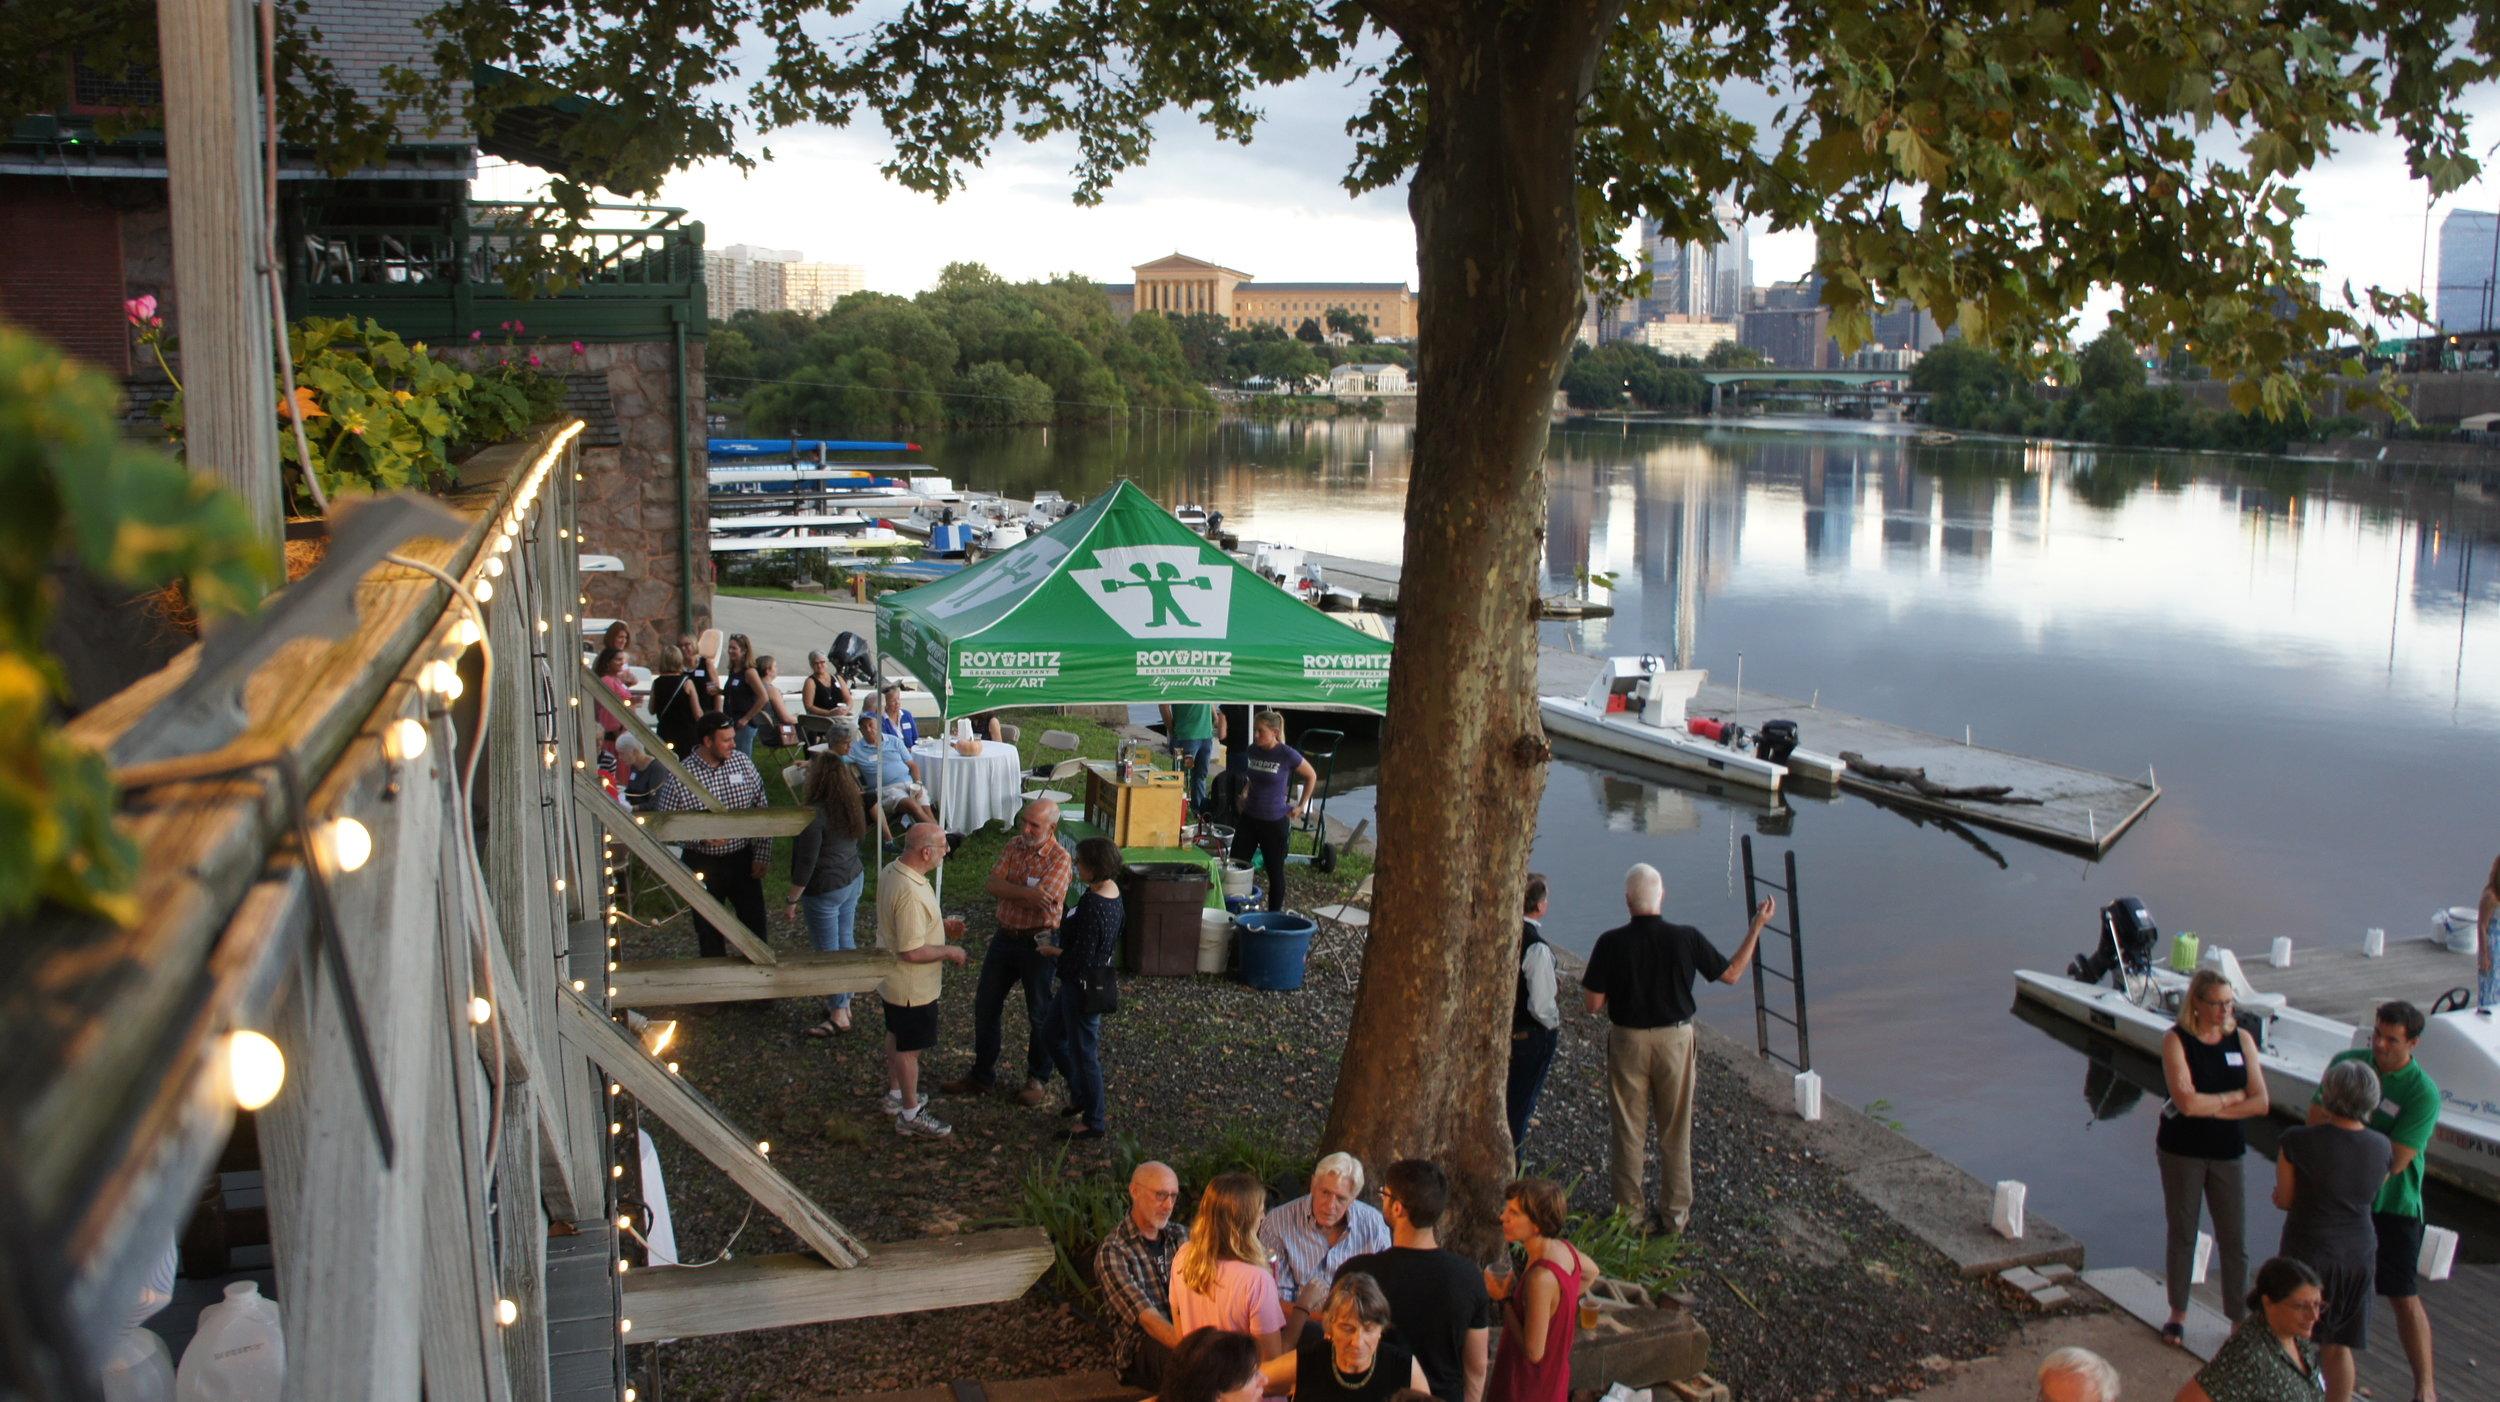 boats-brews-bbq-event.JPG